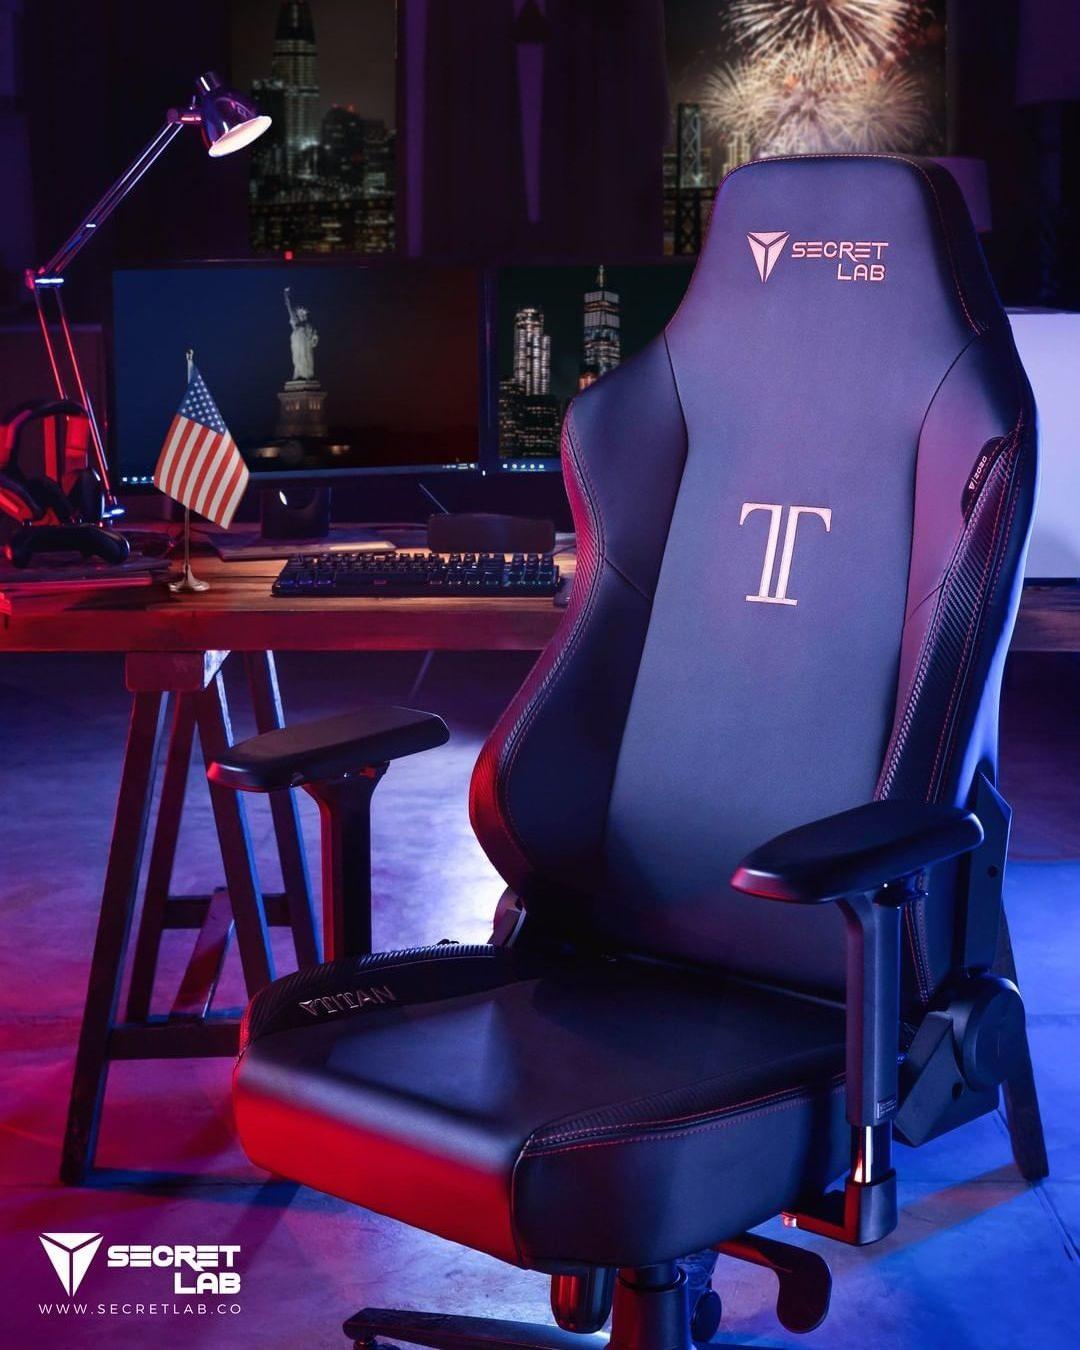 gaming chair -secret lab